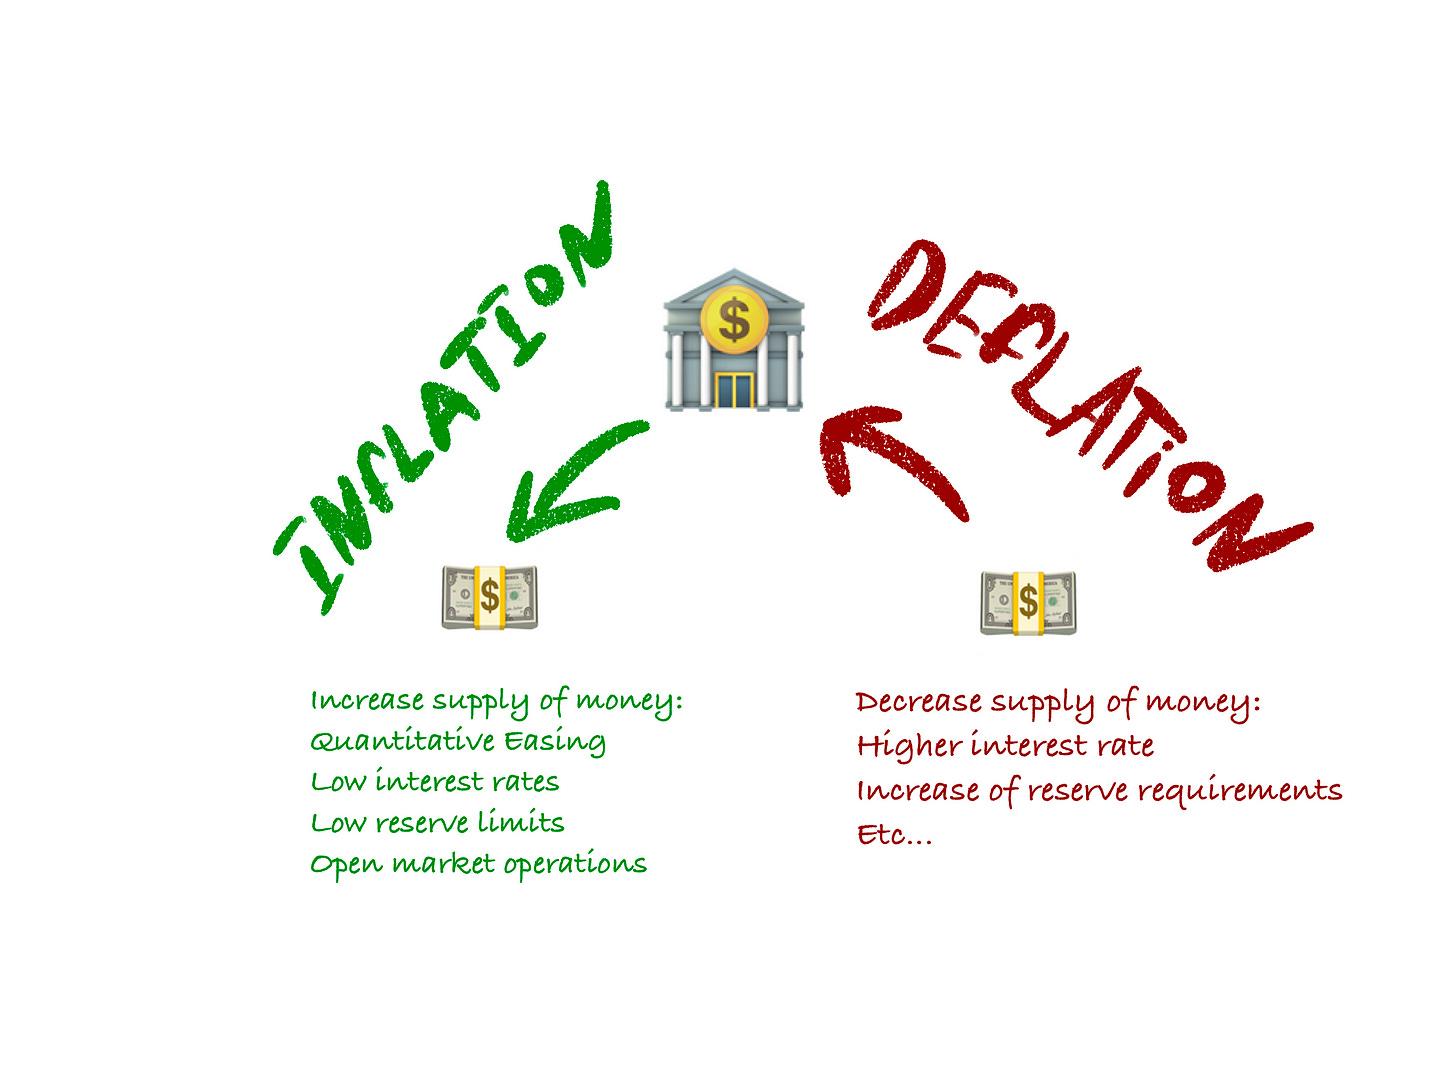 #003 Blunt Economics Part 2: Where did the money go?